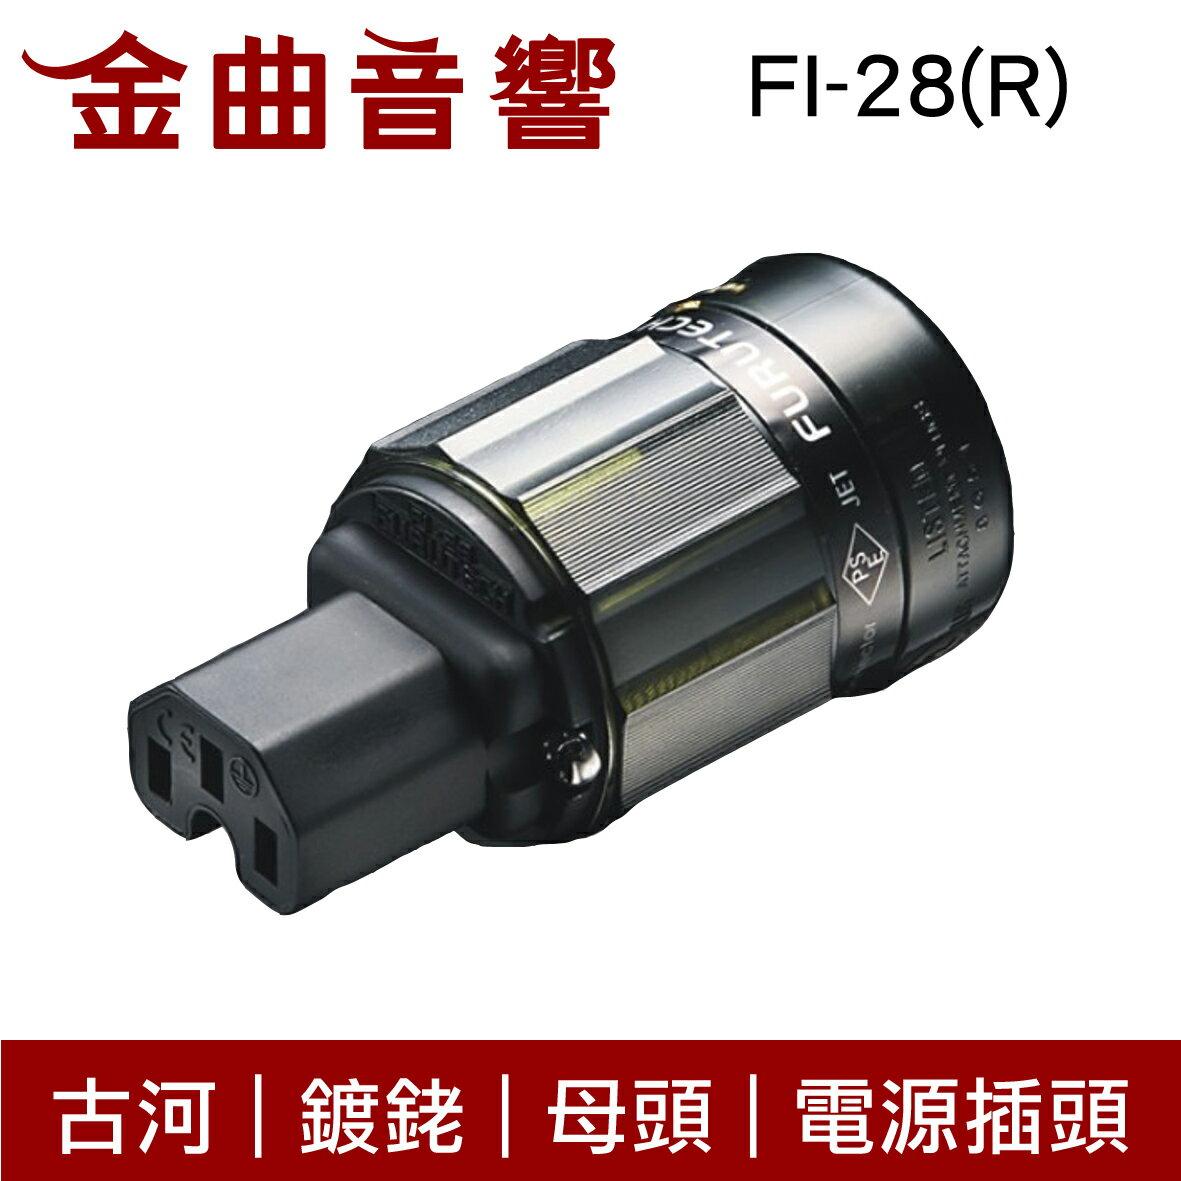 FURUTECH 古河 FI-28(R) 鍍銠 母頭 電源插頭 | 金曲音響